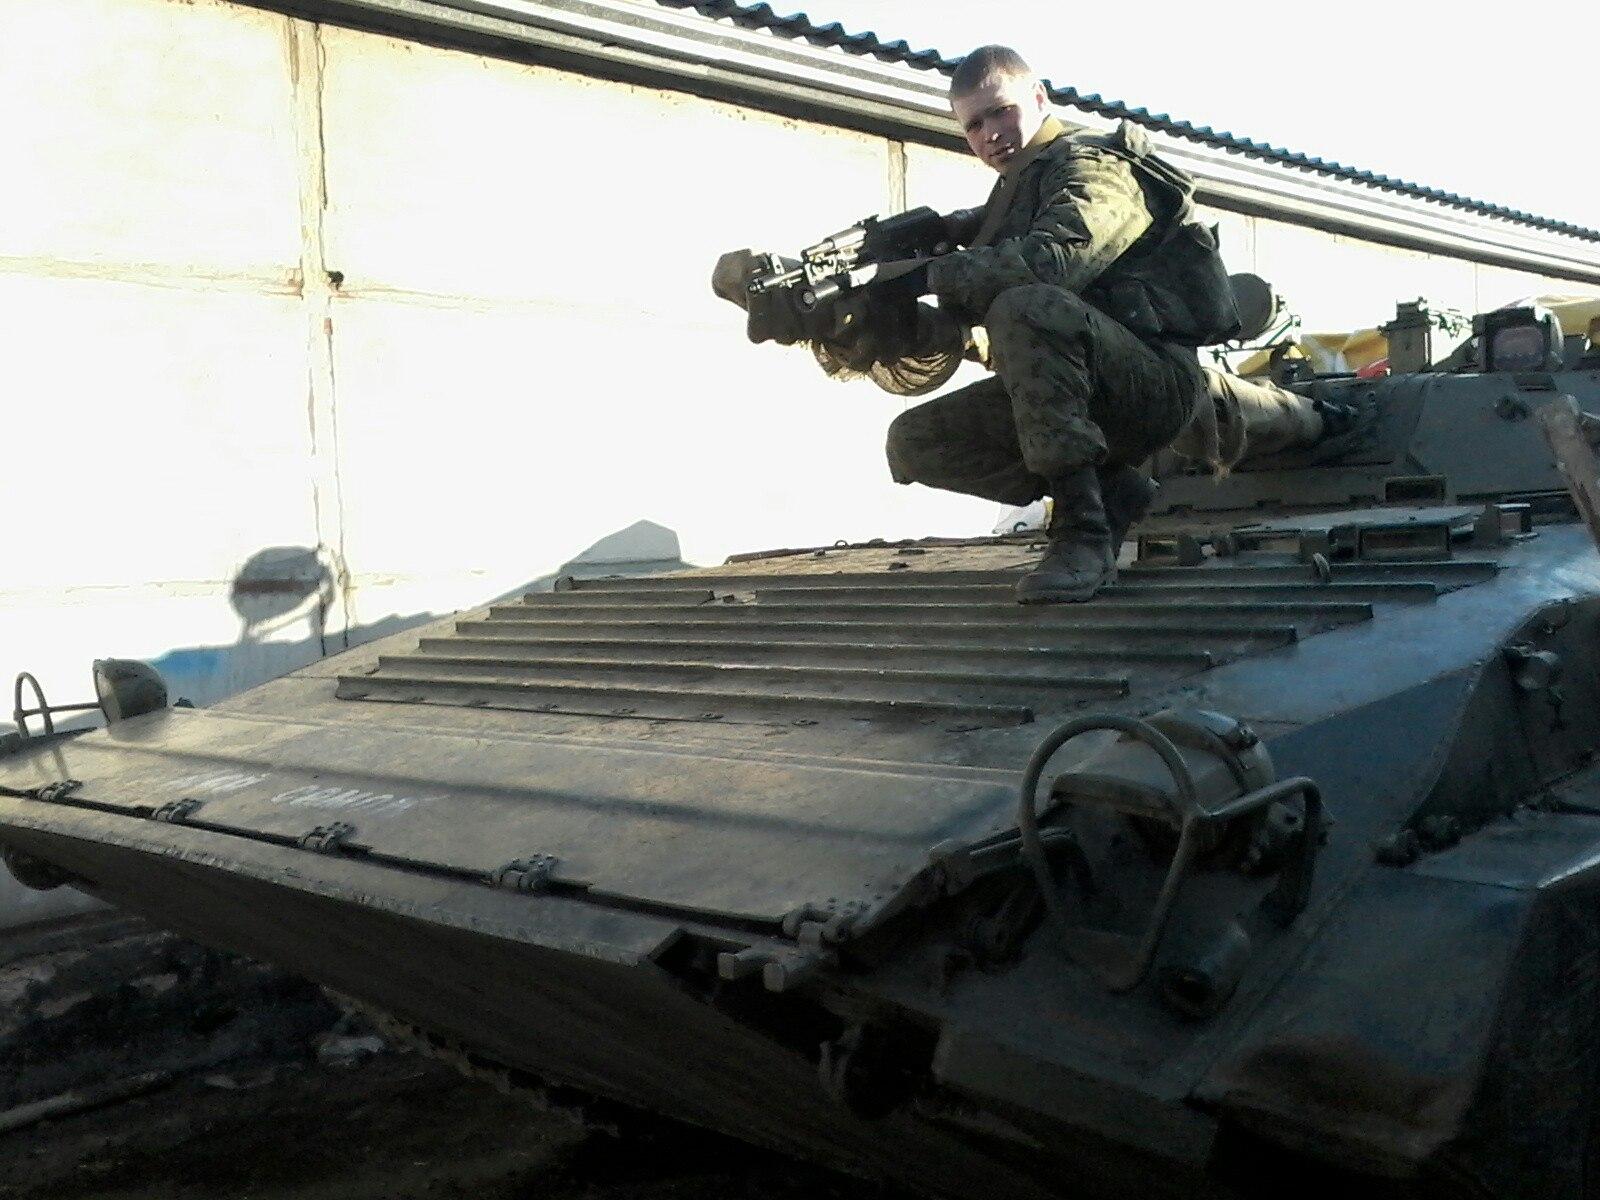 Donbass Liberation War Multimedia - Page 3 8KkhTSdoXh4